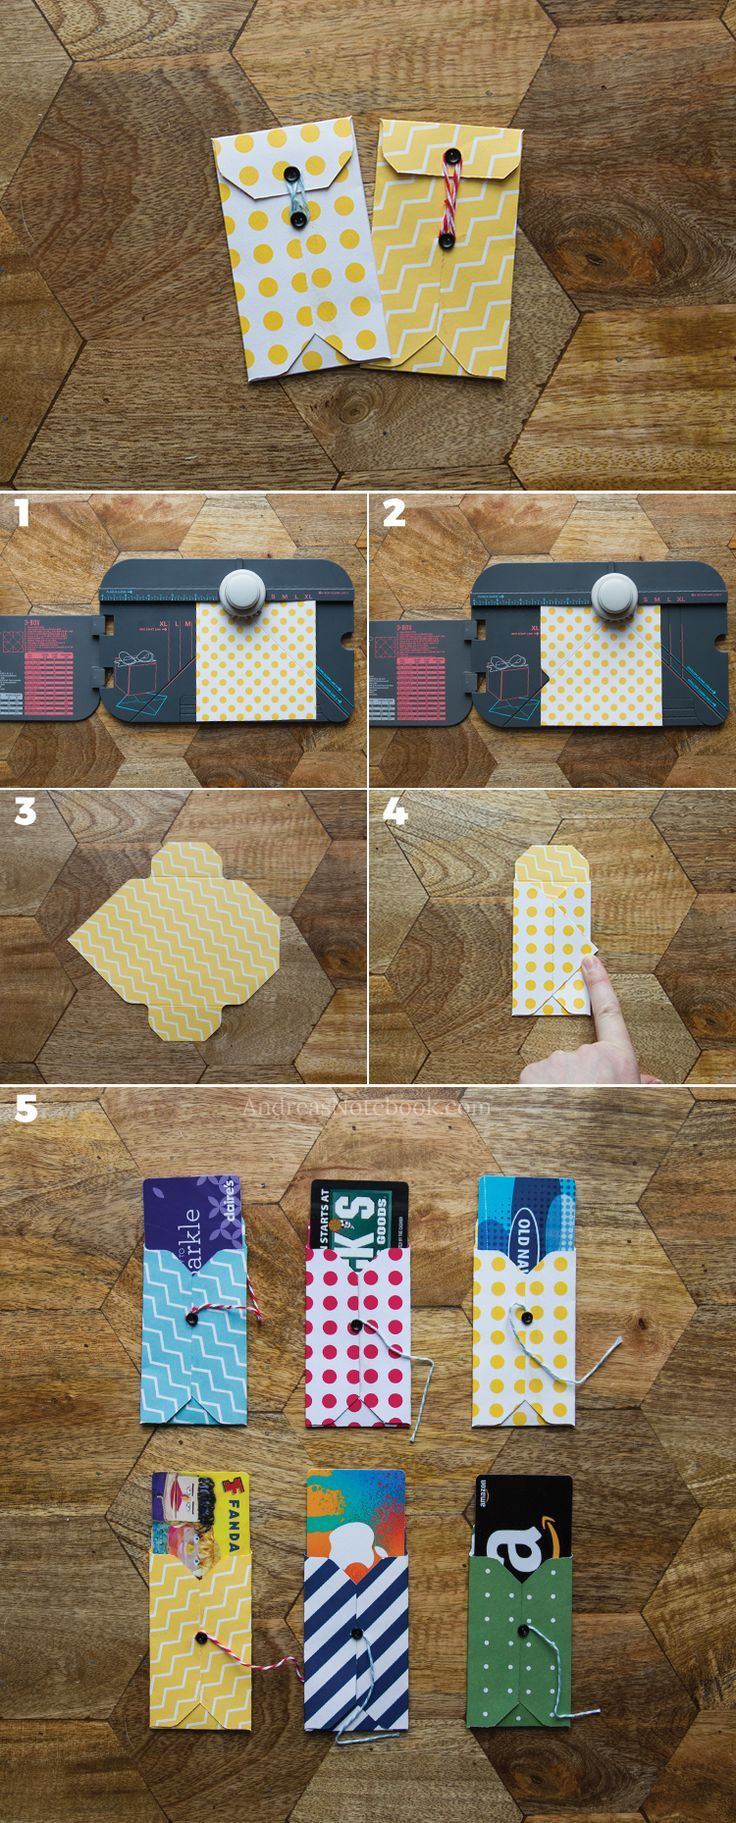 Упаковка для карт своими руками фото 422